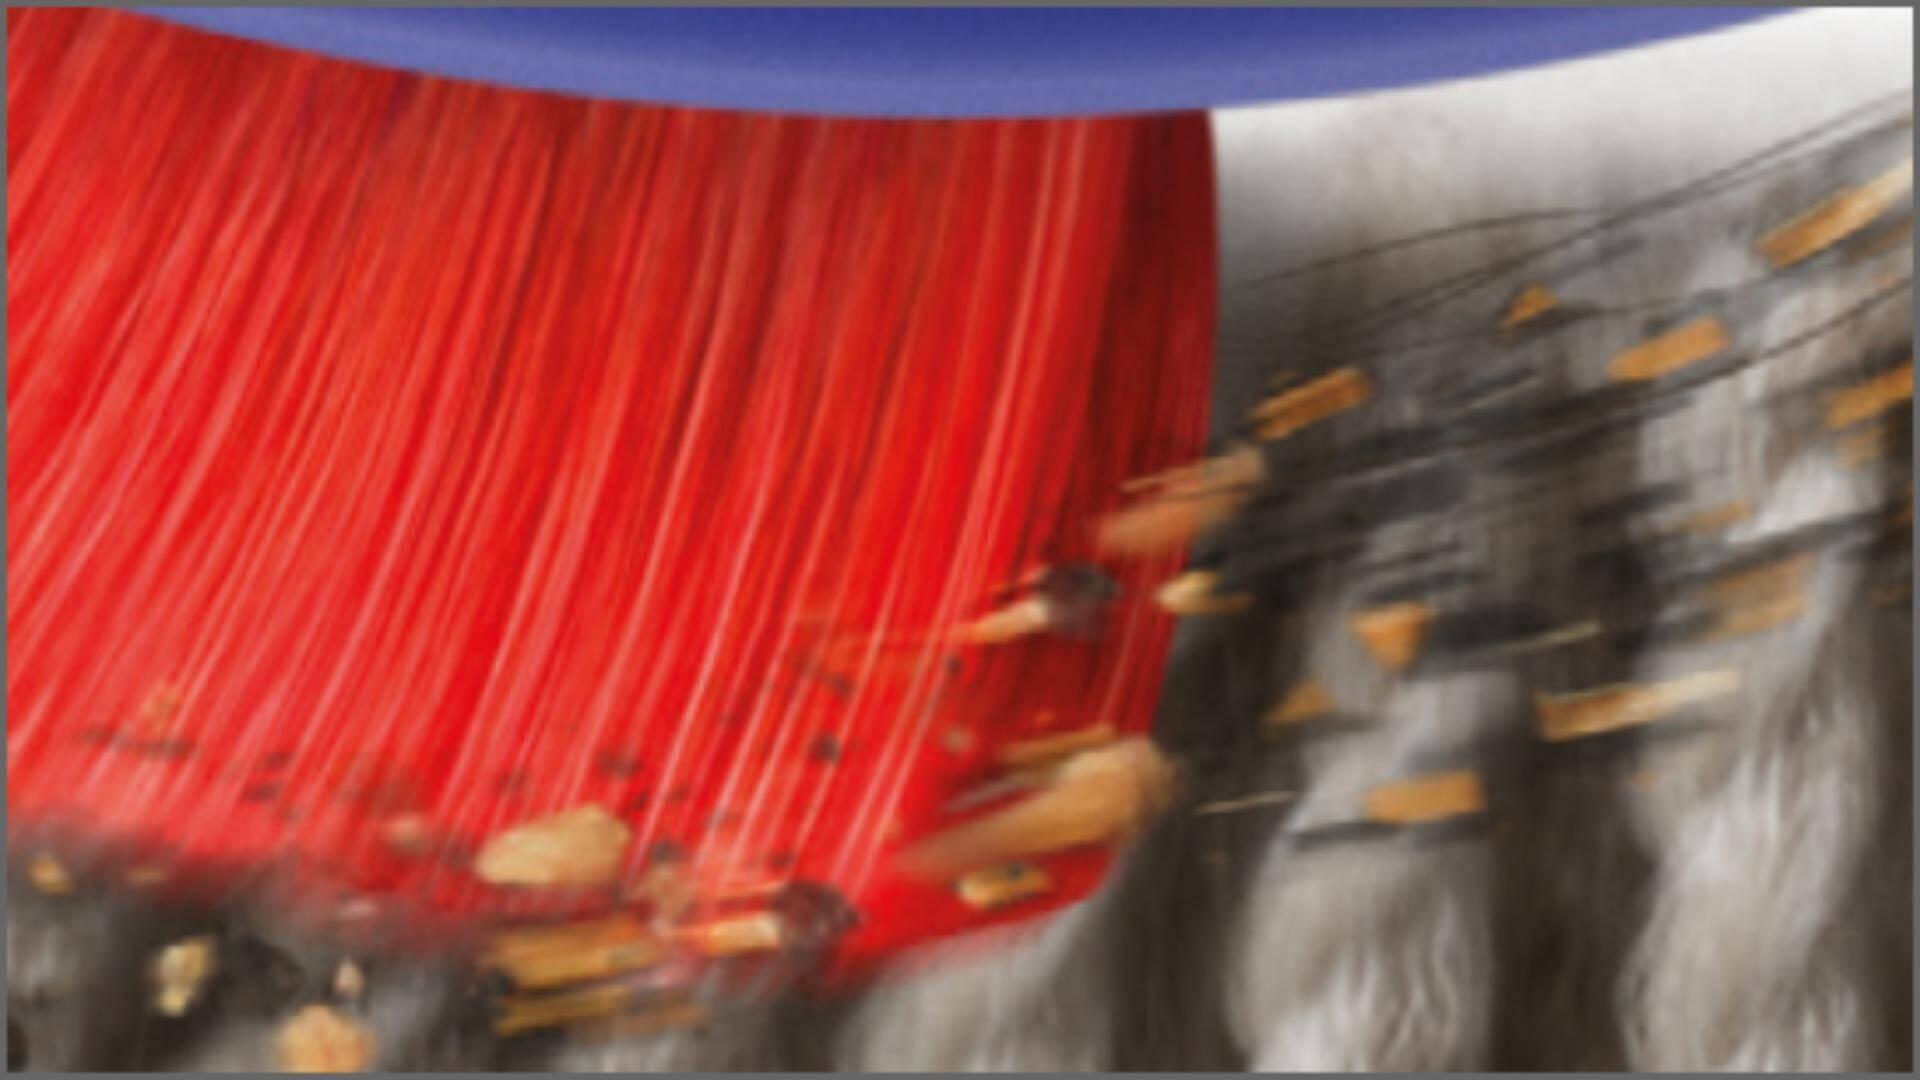 7815-taneden-olusmus-sert naylon killar